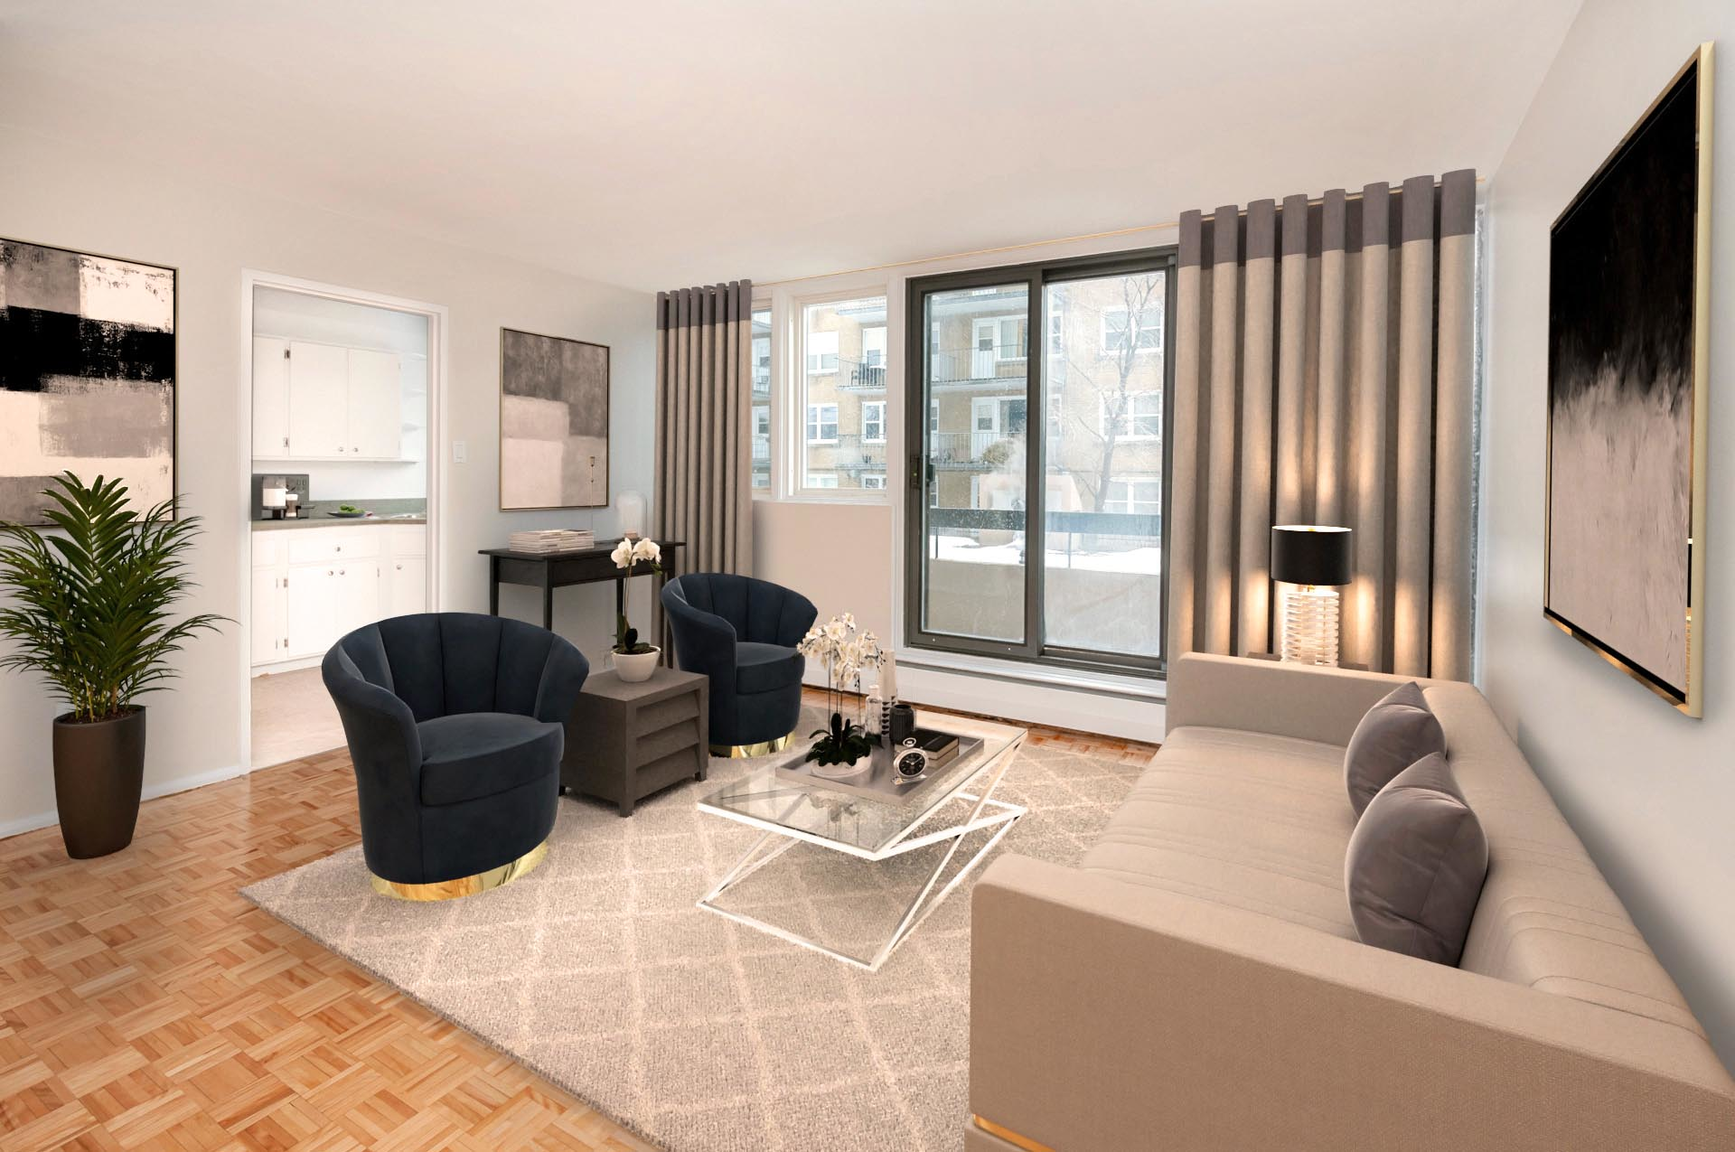 1 bedroom Apartments for rent in Quebec City at Place Samuel de Champlain - Photo 13 - RentersPages – L407129